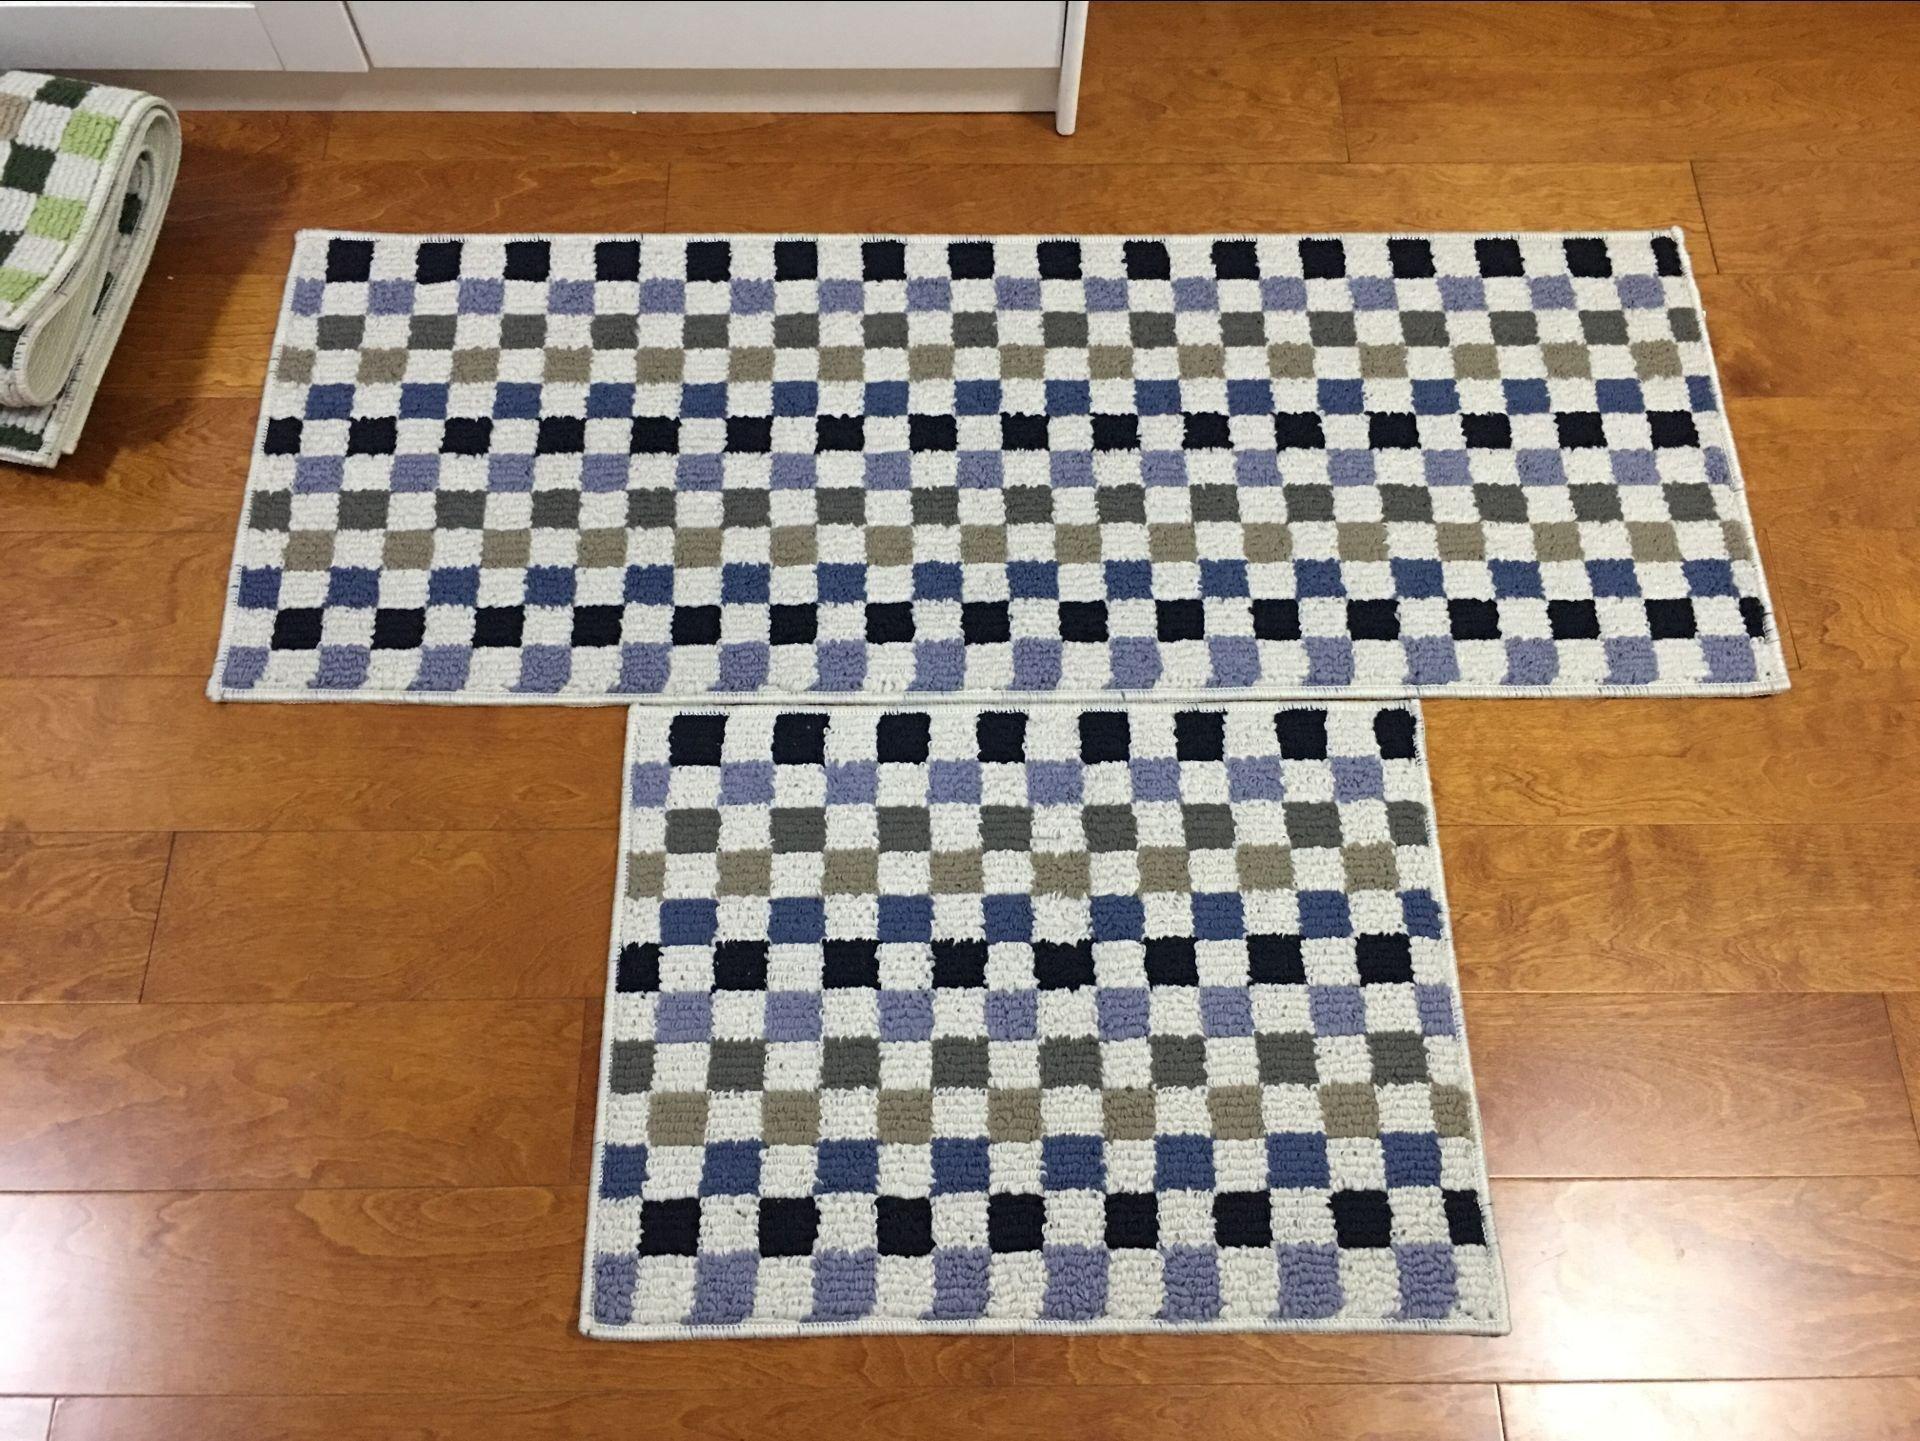 Easychan 2 Piece Carpet Rubber Backing Non-Slip Kitchen Rugs Mat Doormat Area